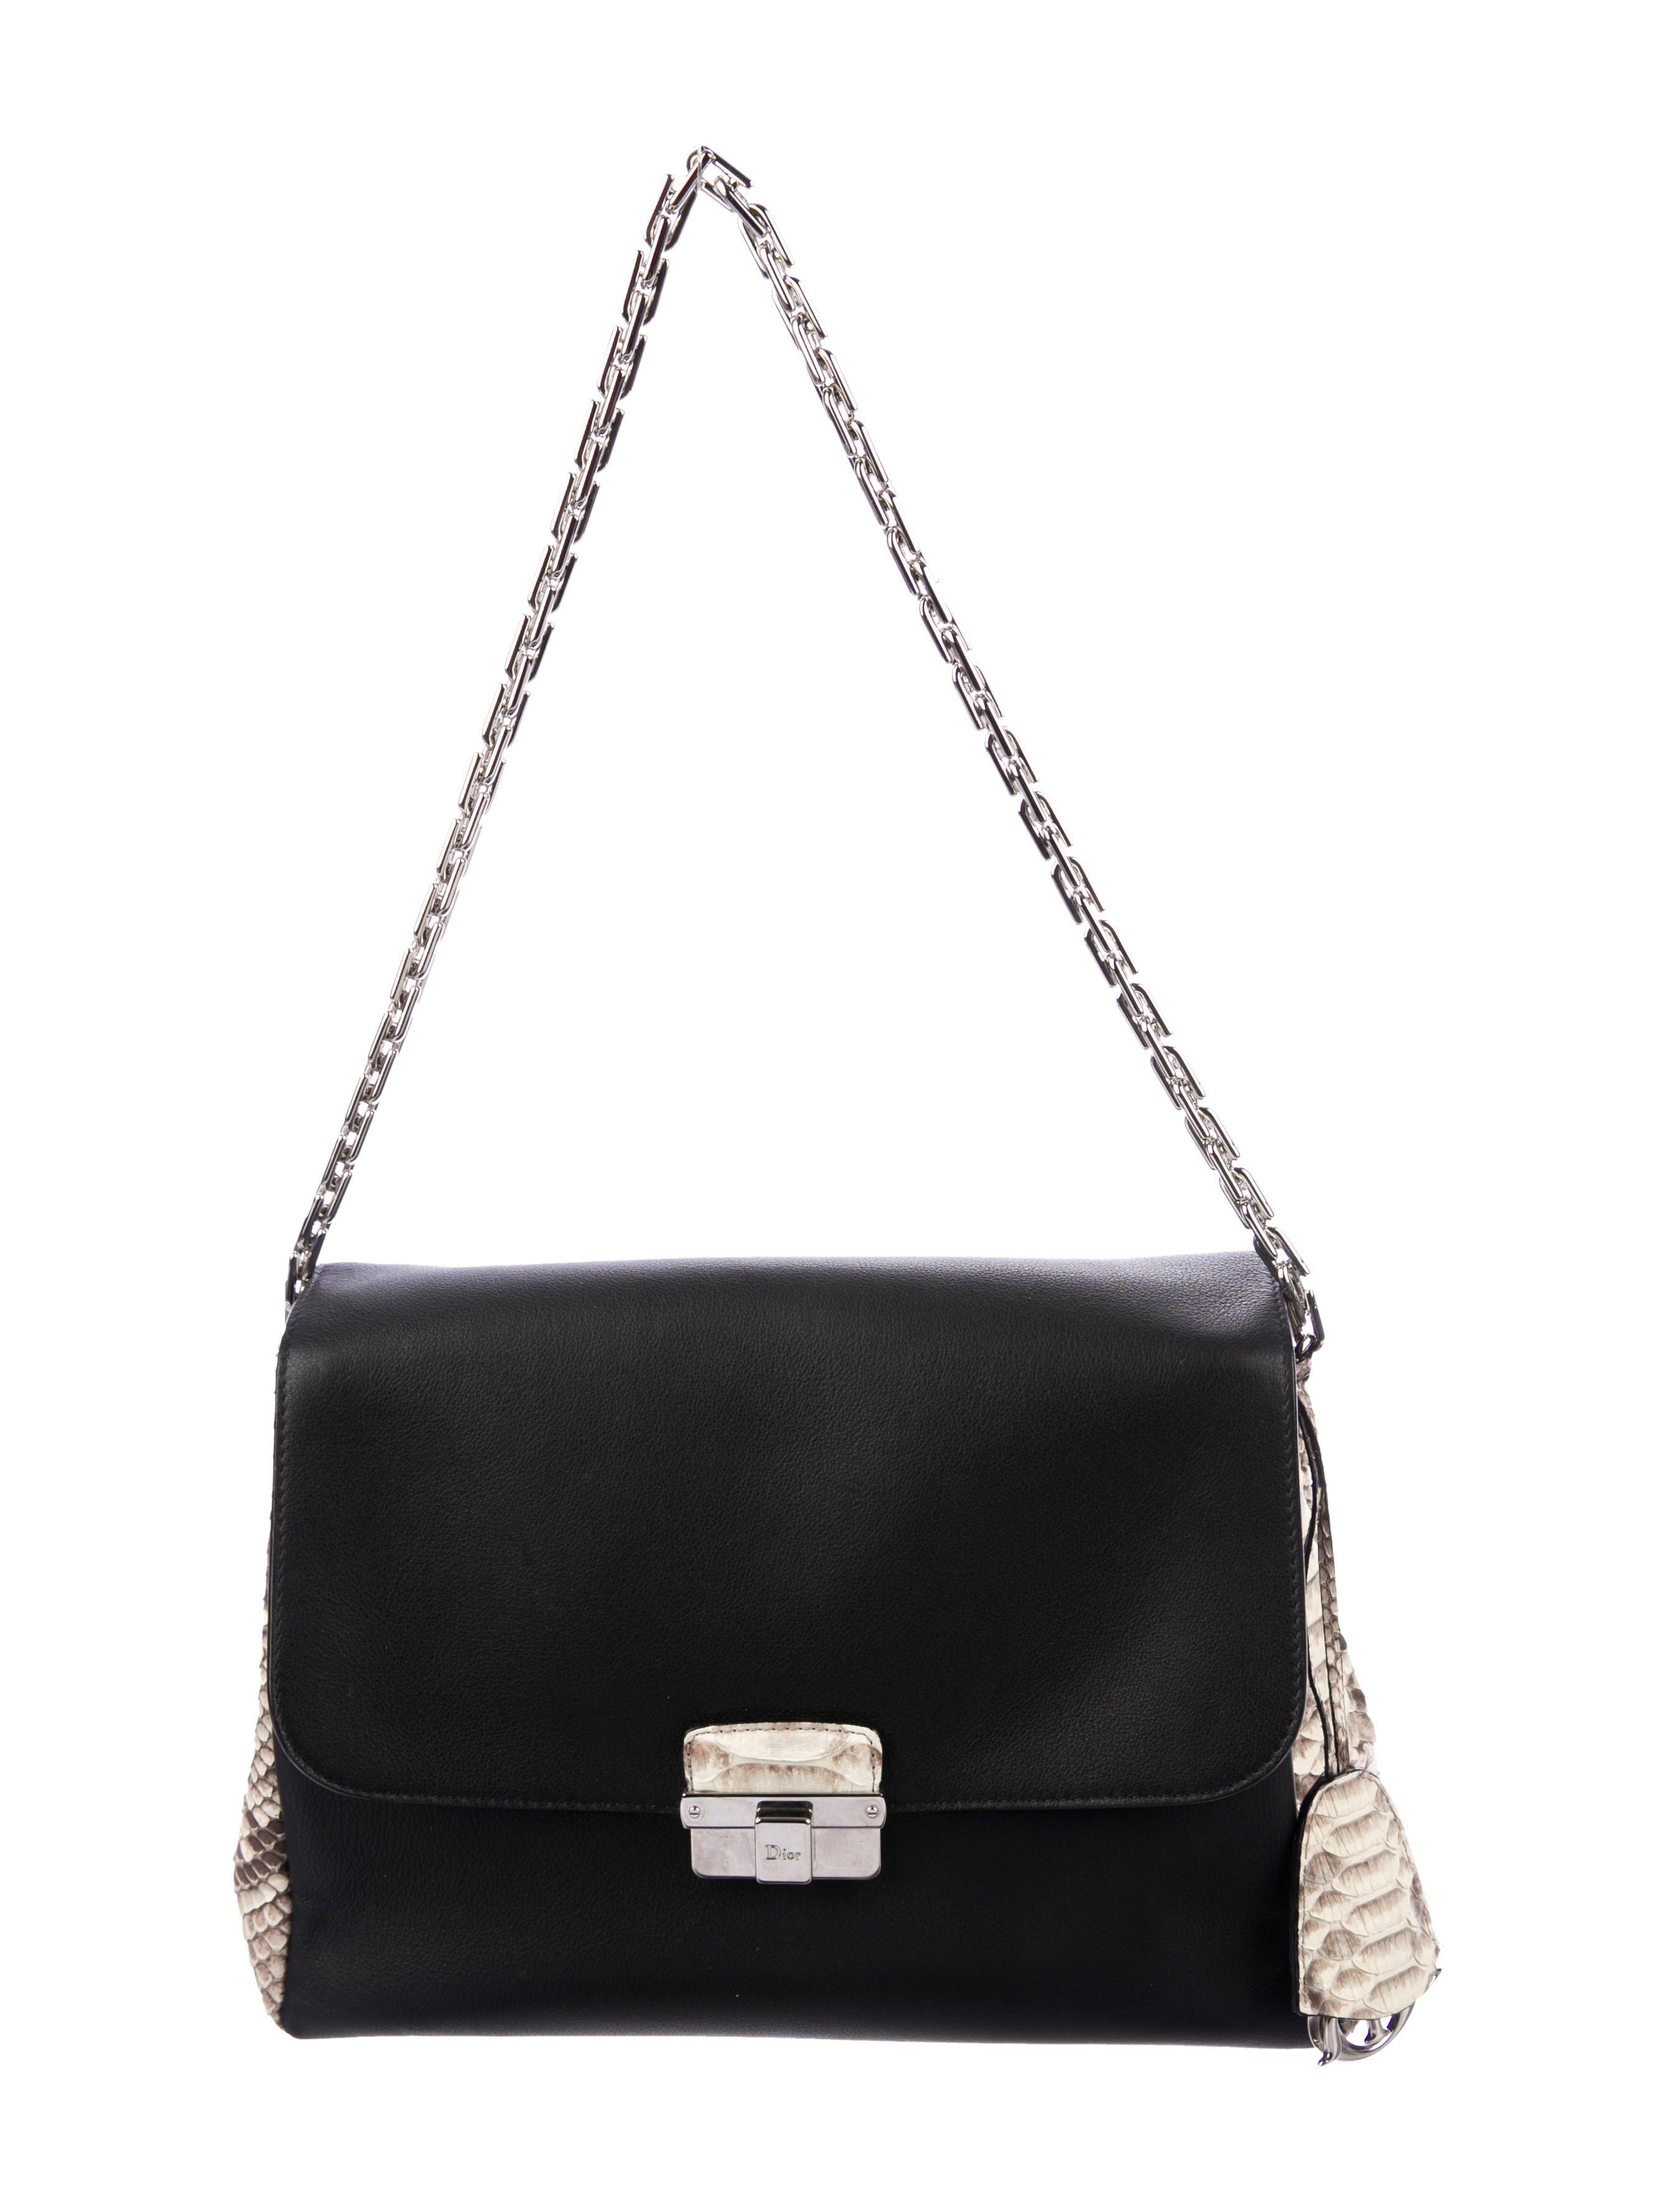 5ab397c8d2 Trimmed Bag Christian Dior Python Diorling 6qgwWEI8-straits ...